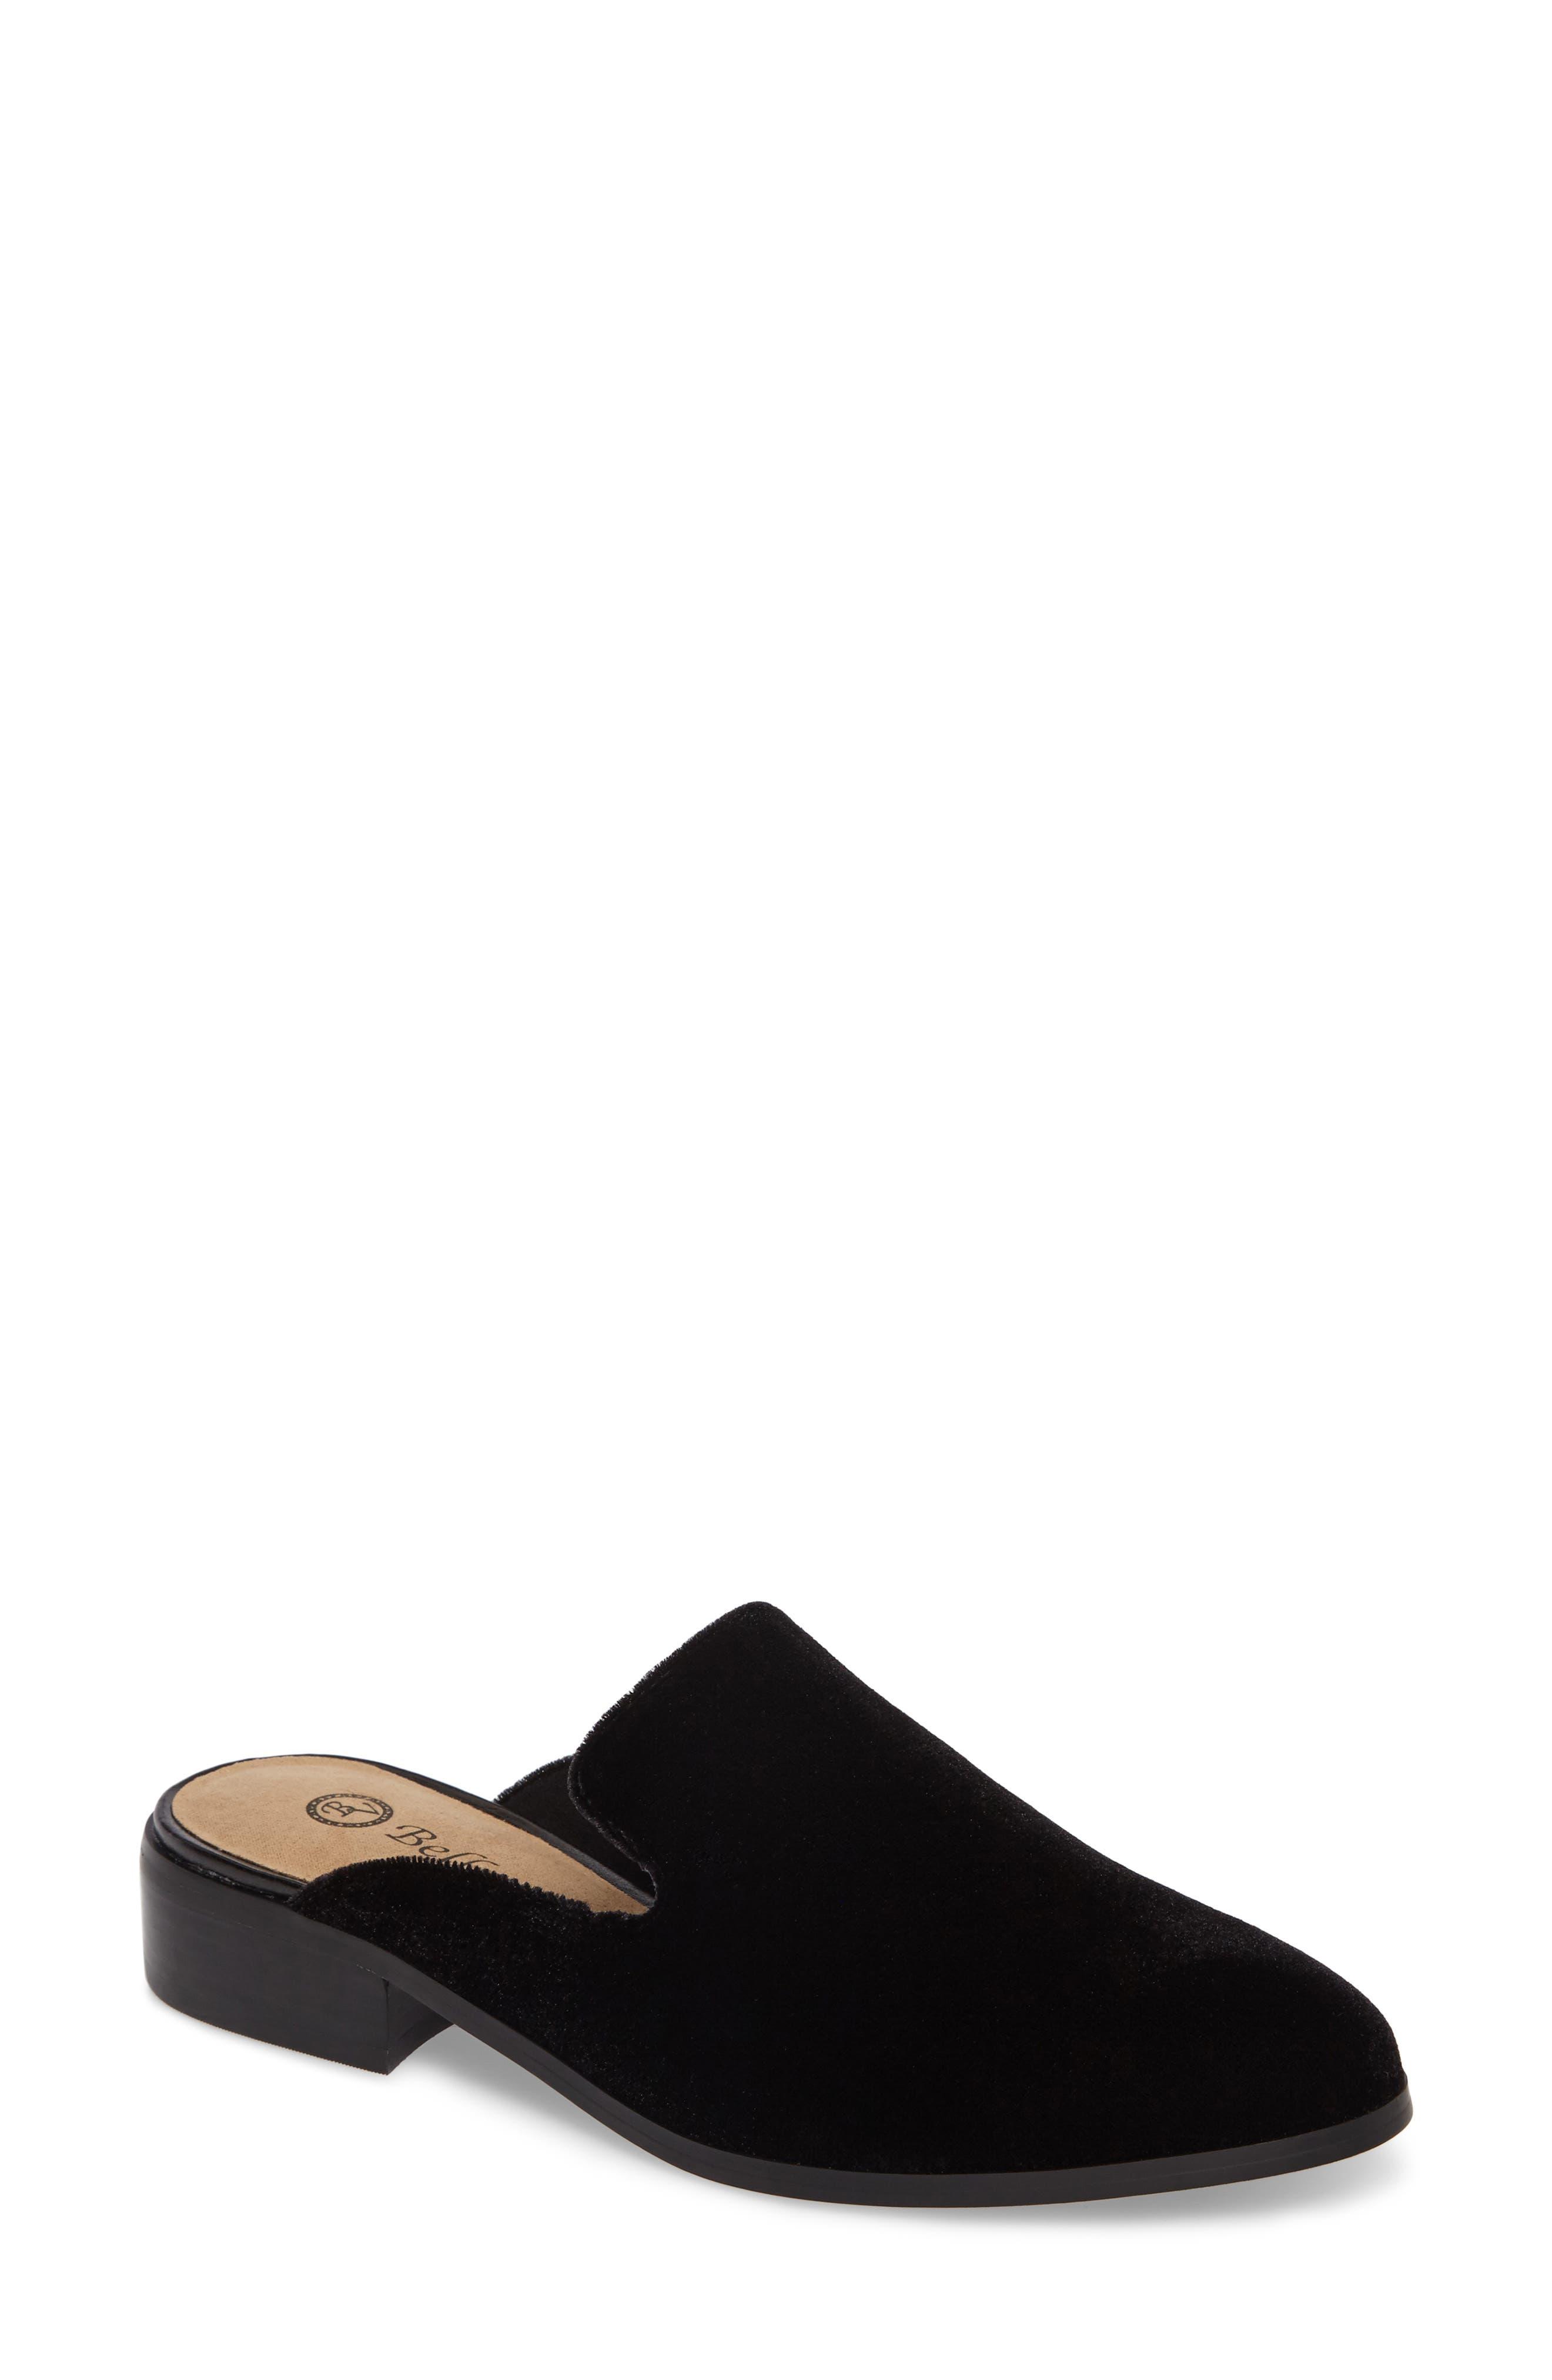 Briar II Loafer Mule,                             Main thumbnail 1, color,                             Black Fabric